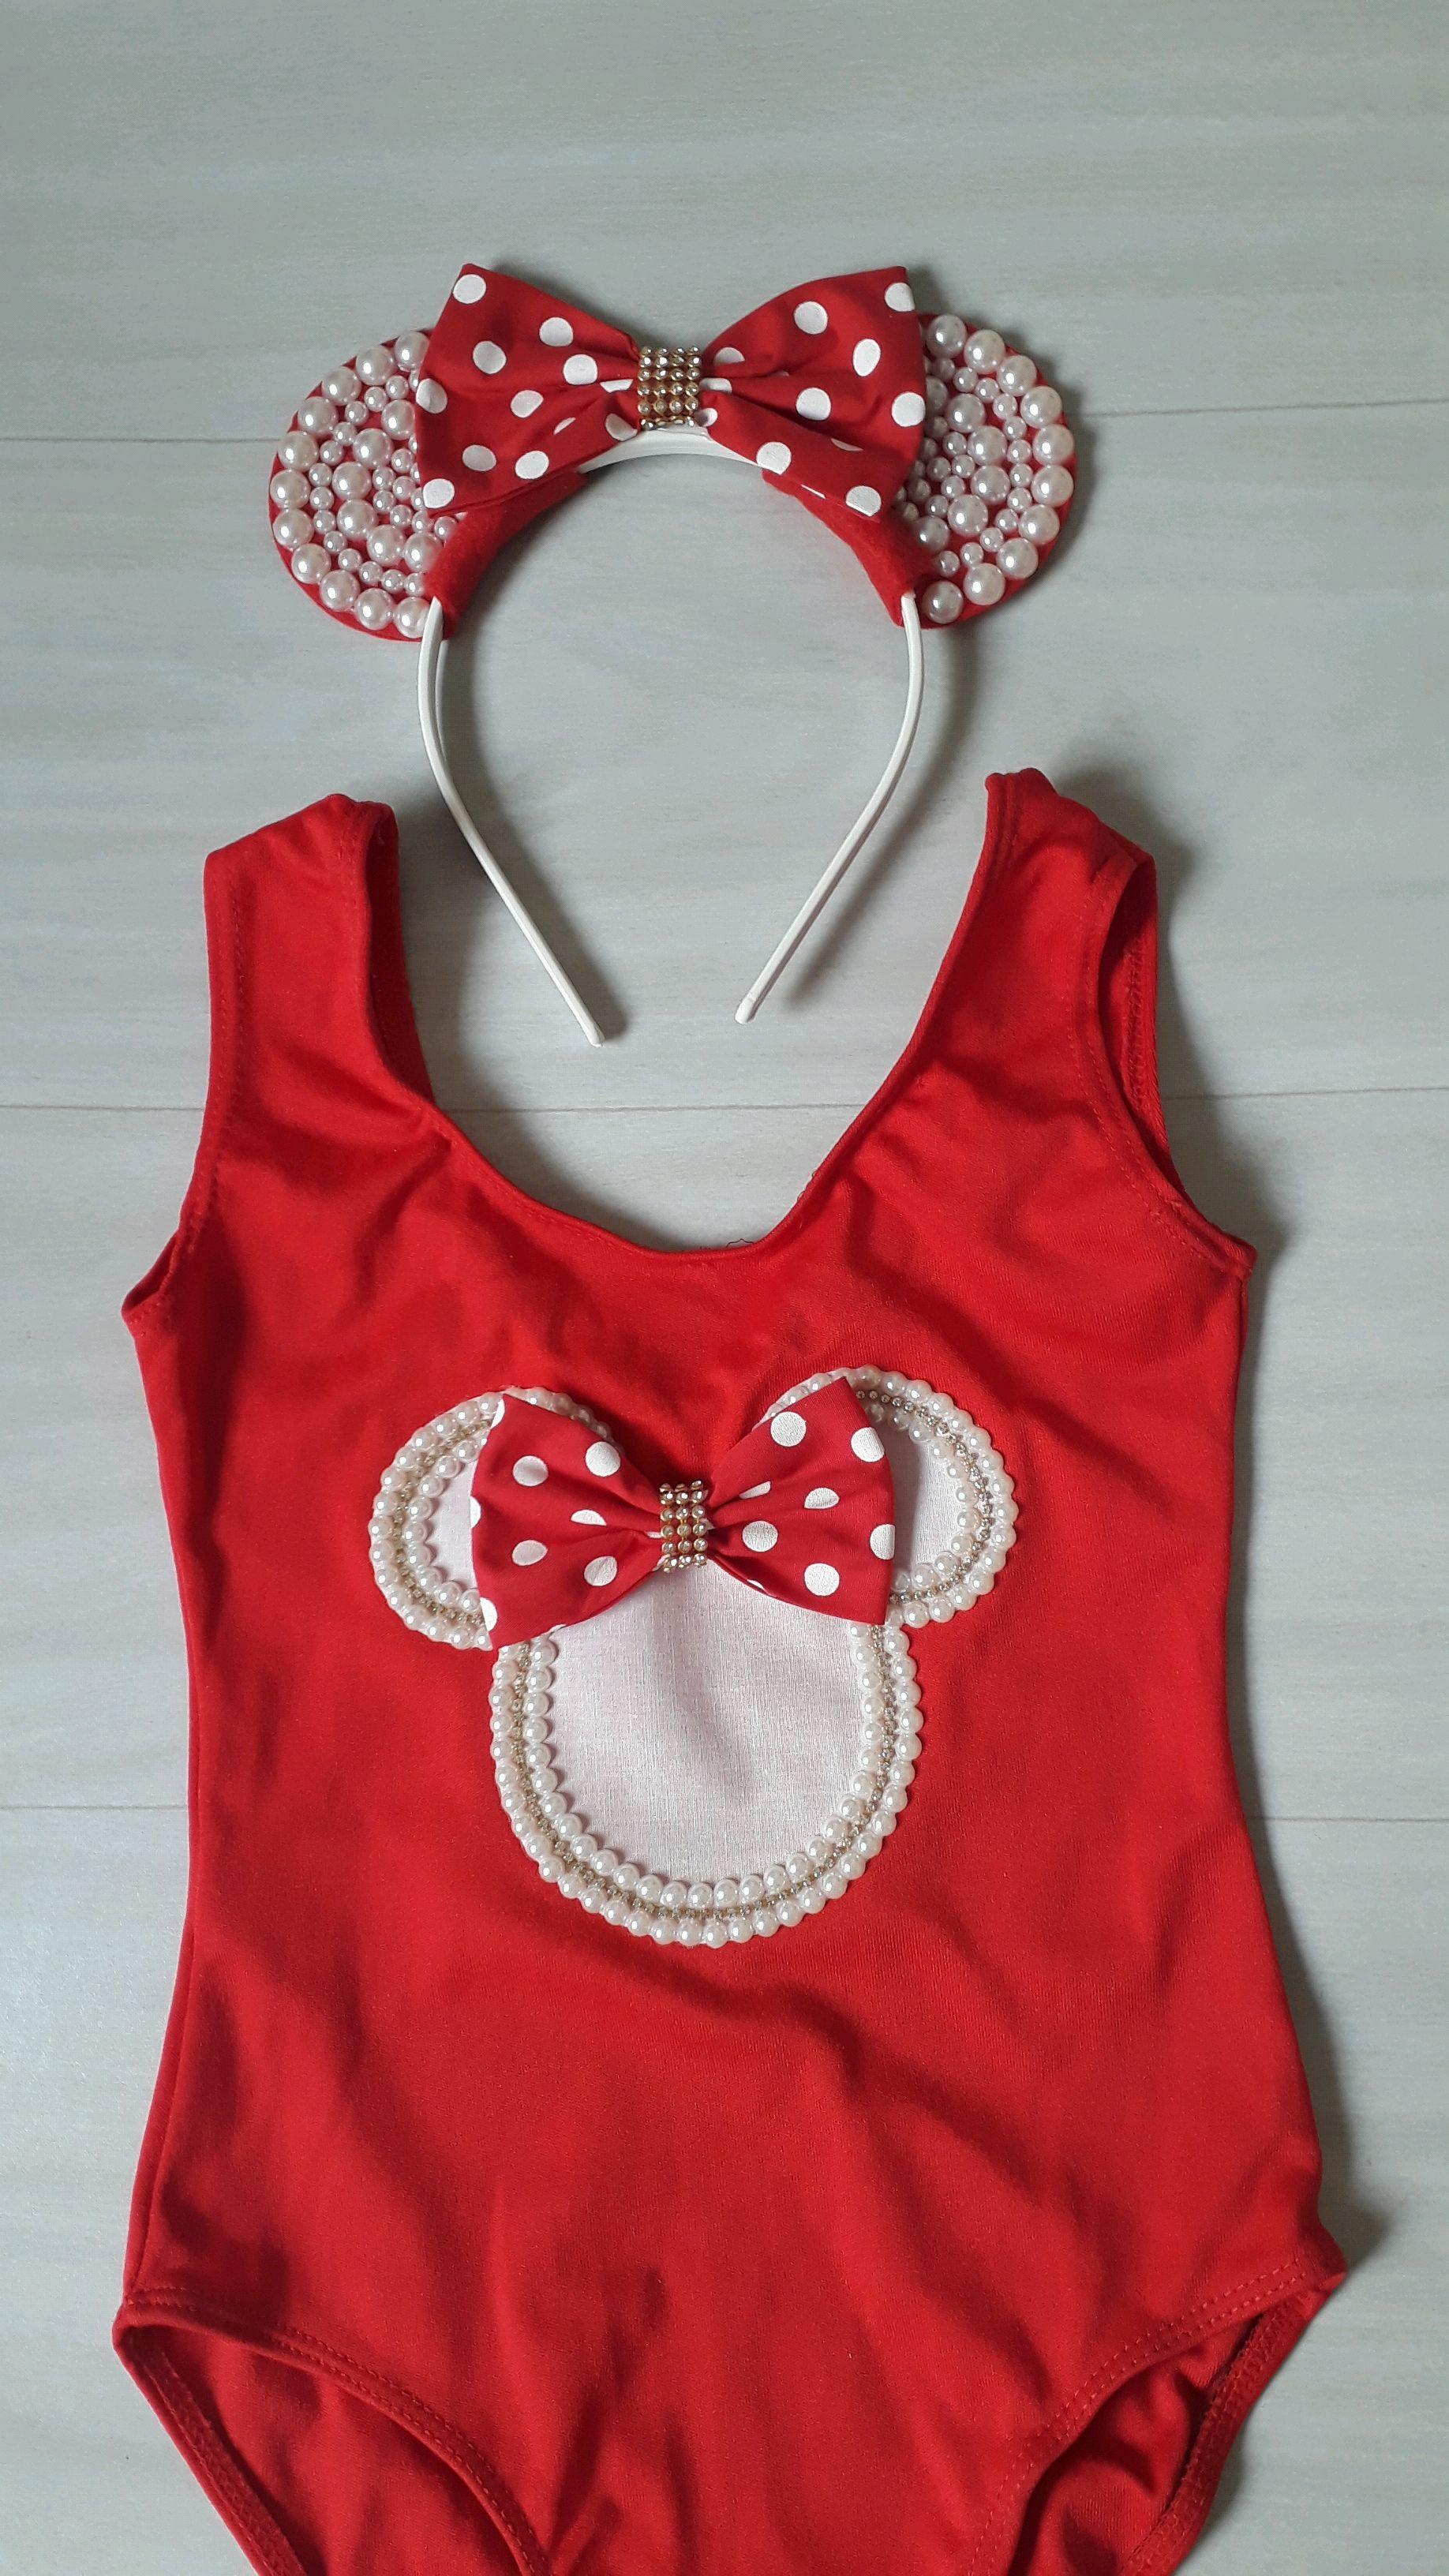 a2b577325d Collant Feminino da Minnie